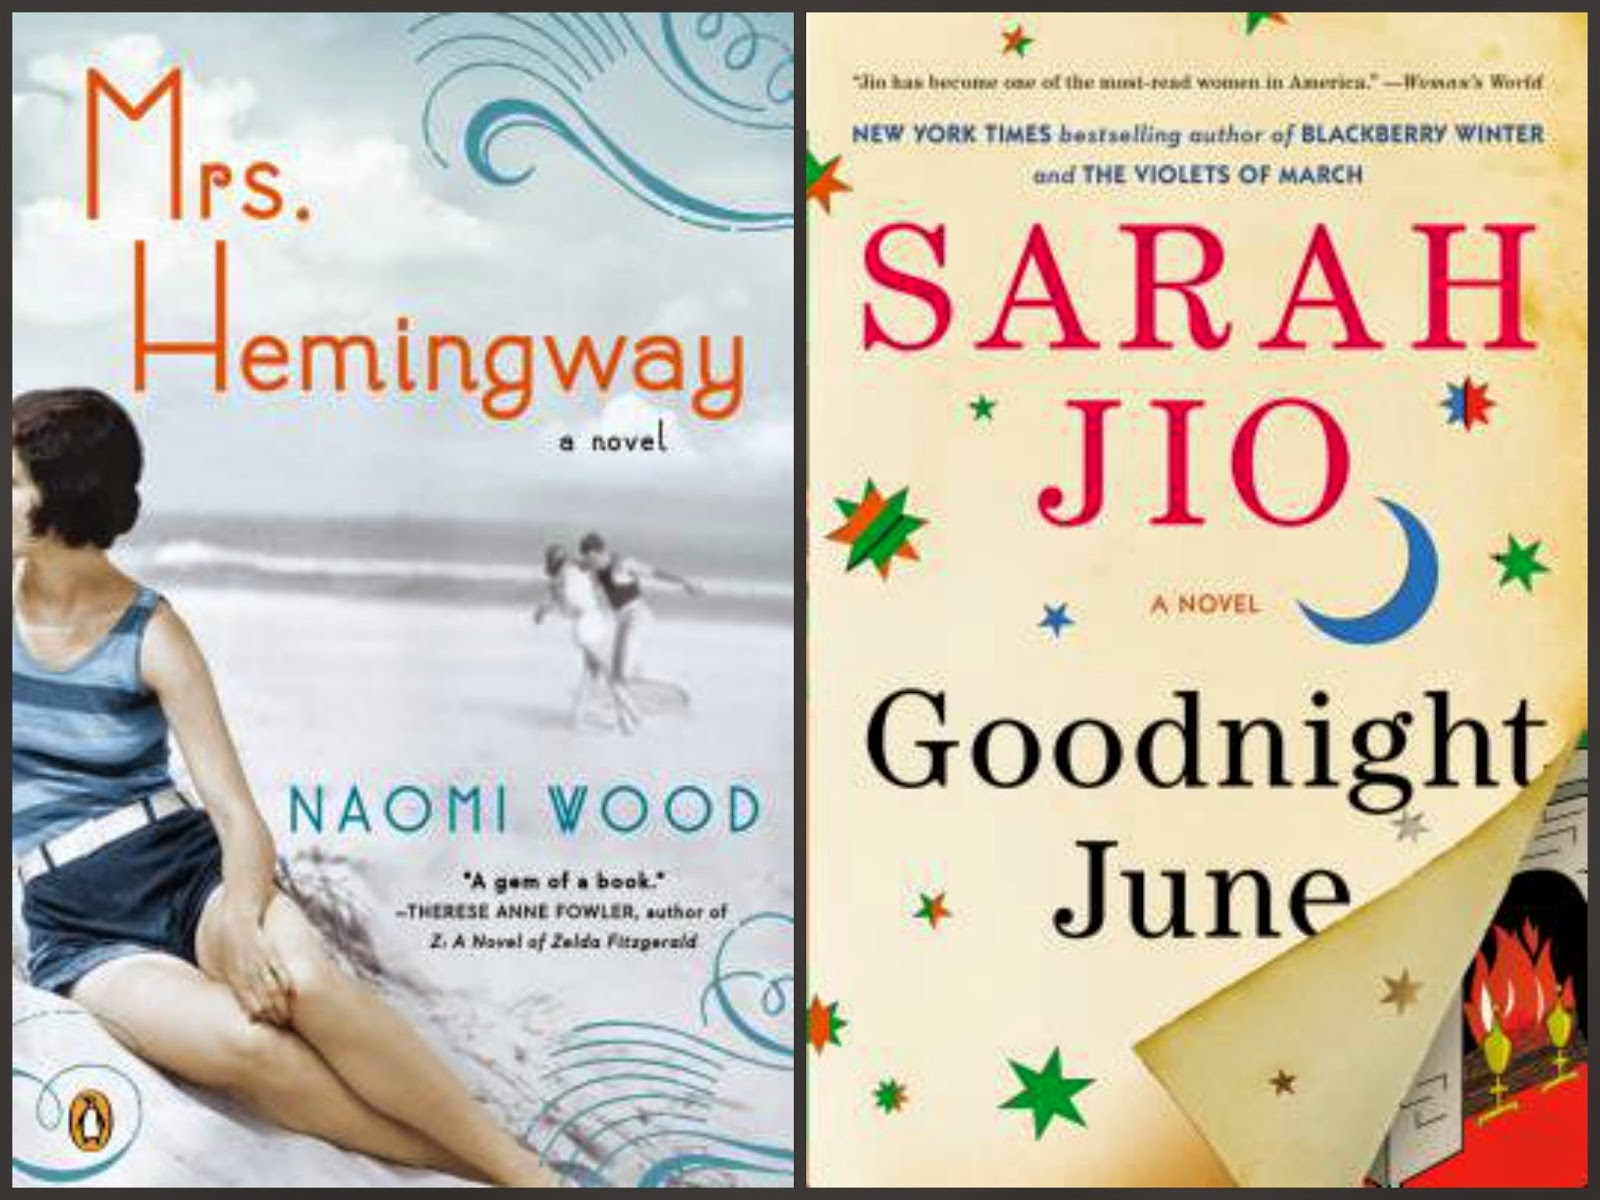 Mrs. Hemingway by Naomi Wood; Goodnight June by Sarah Jio